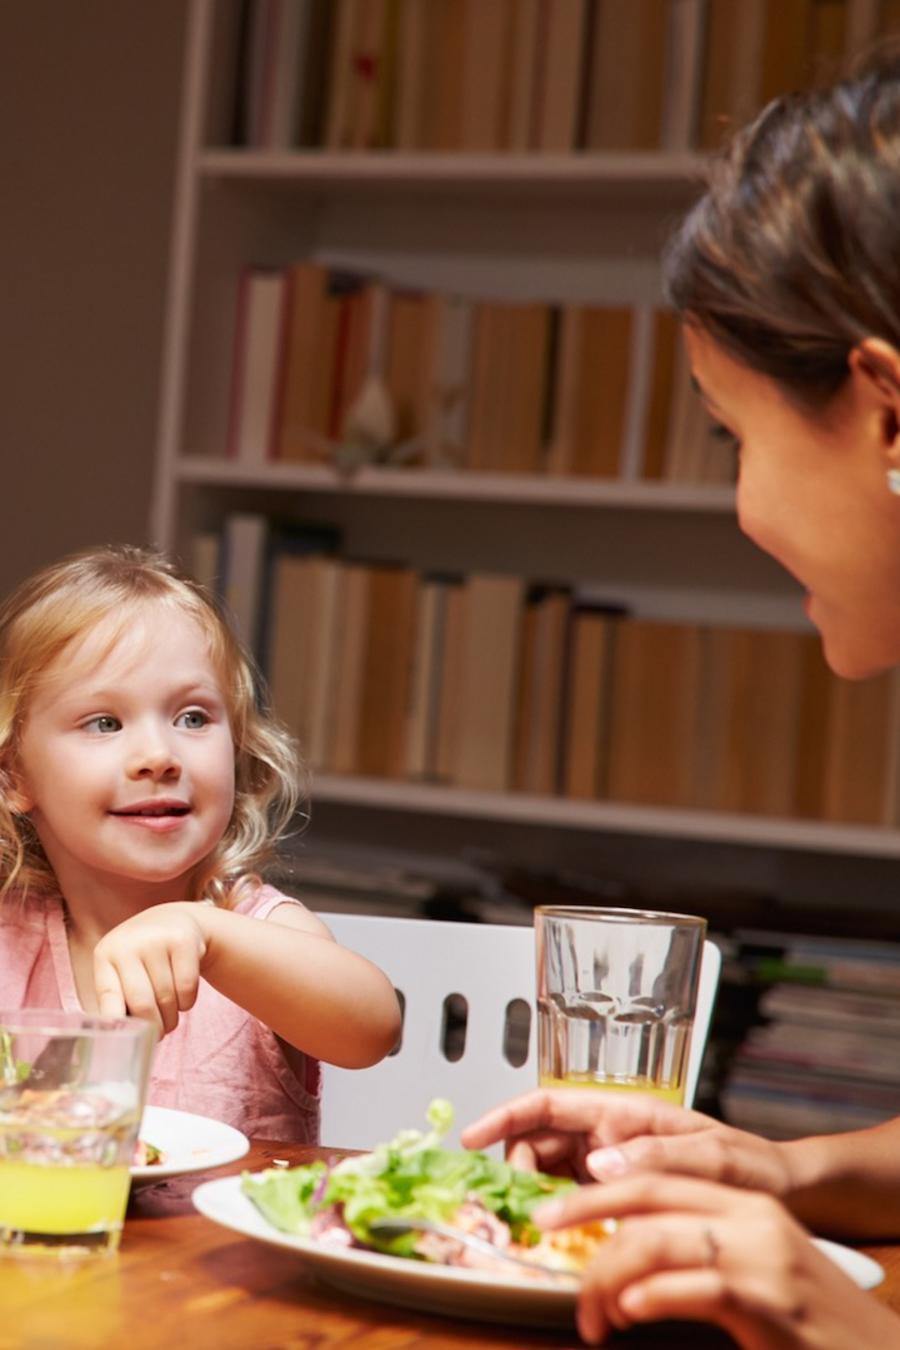 Padres e hija comiendo en la mesa